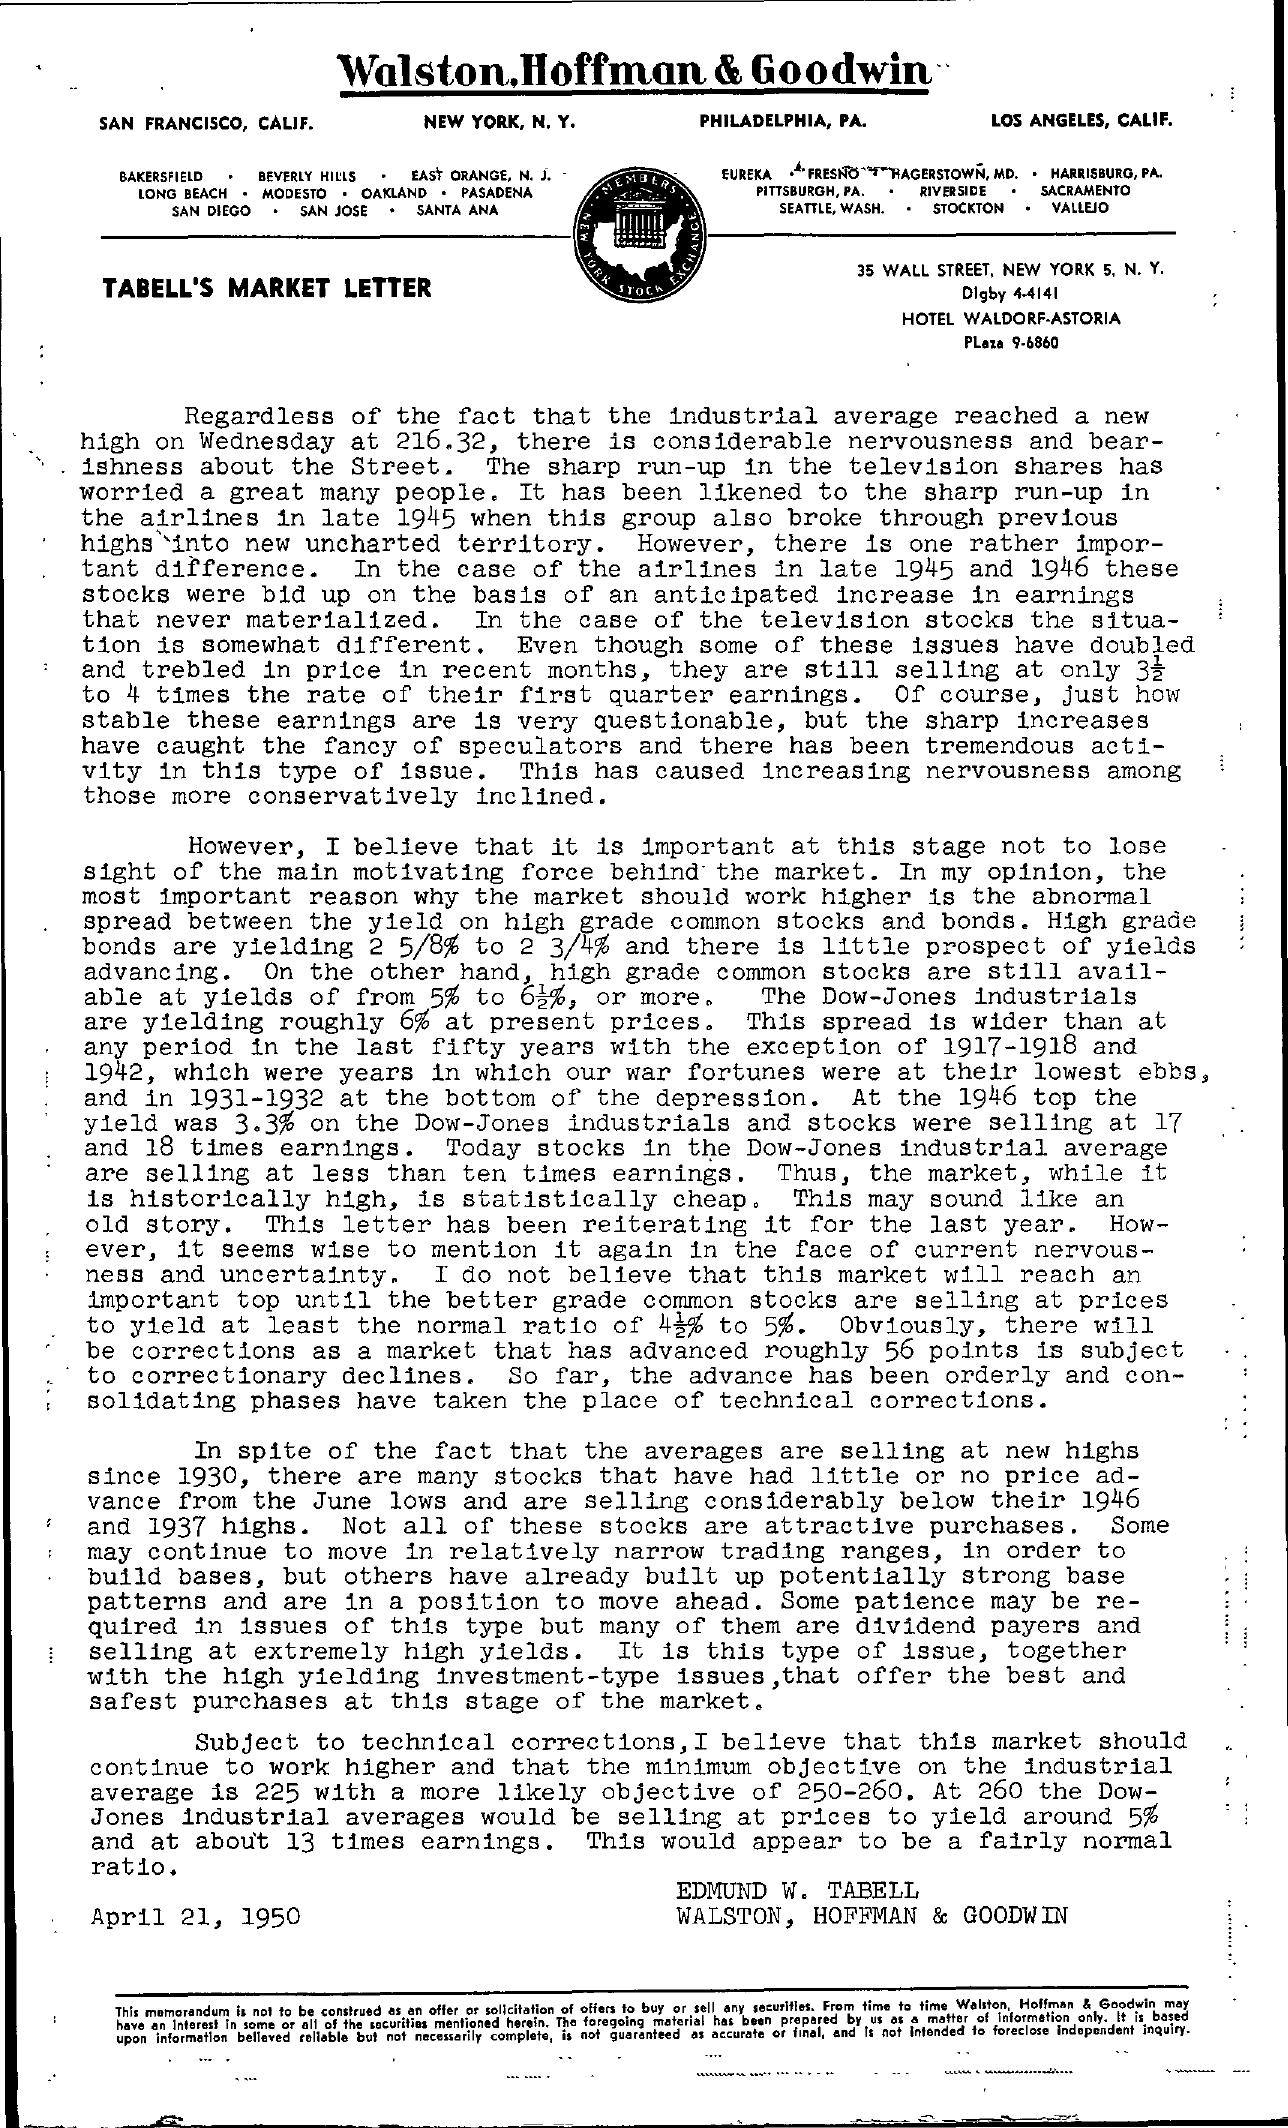 Tabell's Market Letter - April 21, 1950